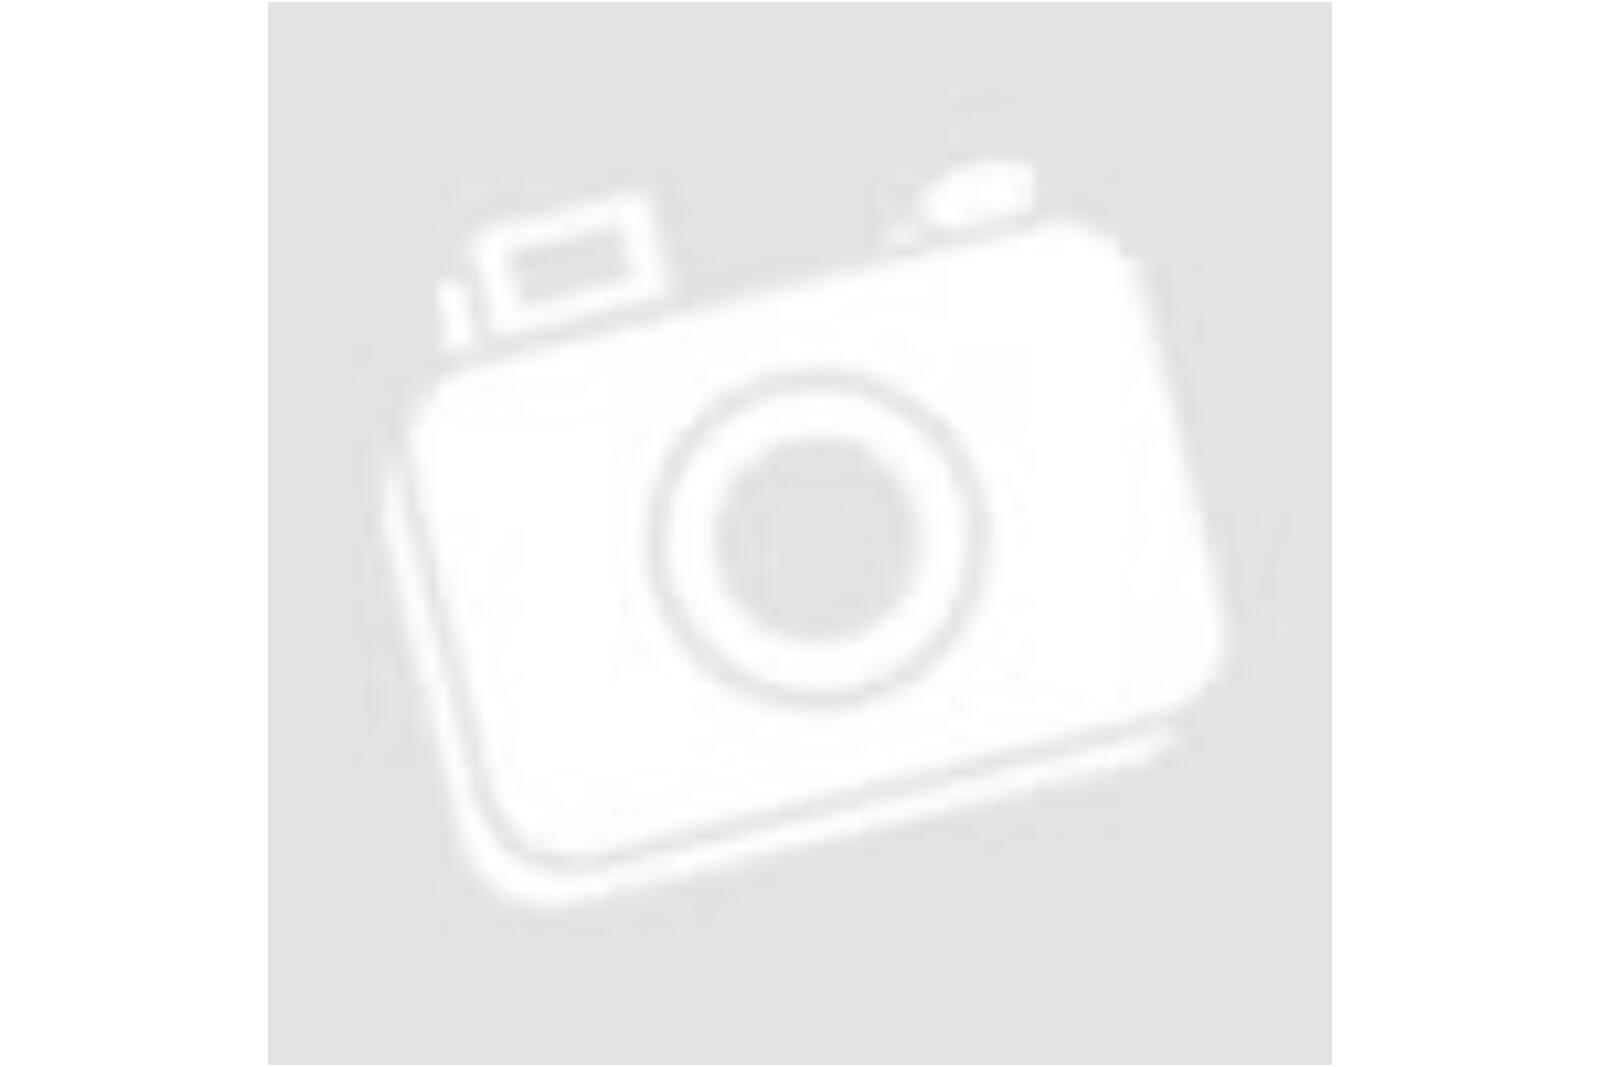 Oliver virágmintás lány szoknya  s. Oliver virágmintás lány szoknya 65b6cf527f